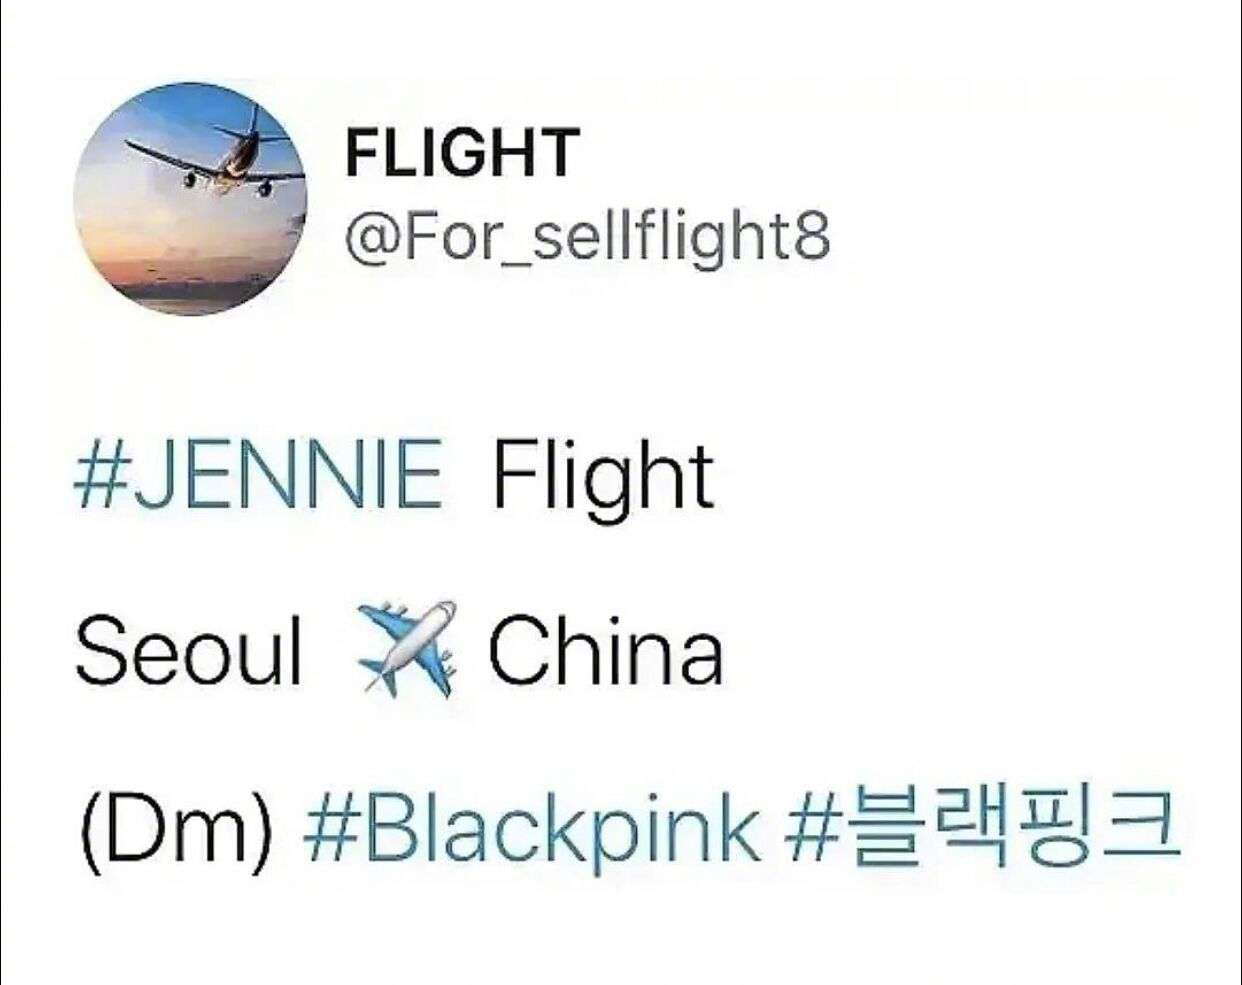 Jennie航班飞中国,难道是要来找Lisa 了吗?青你2飞行导师有可能吗